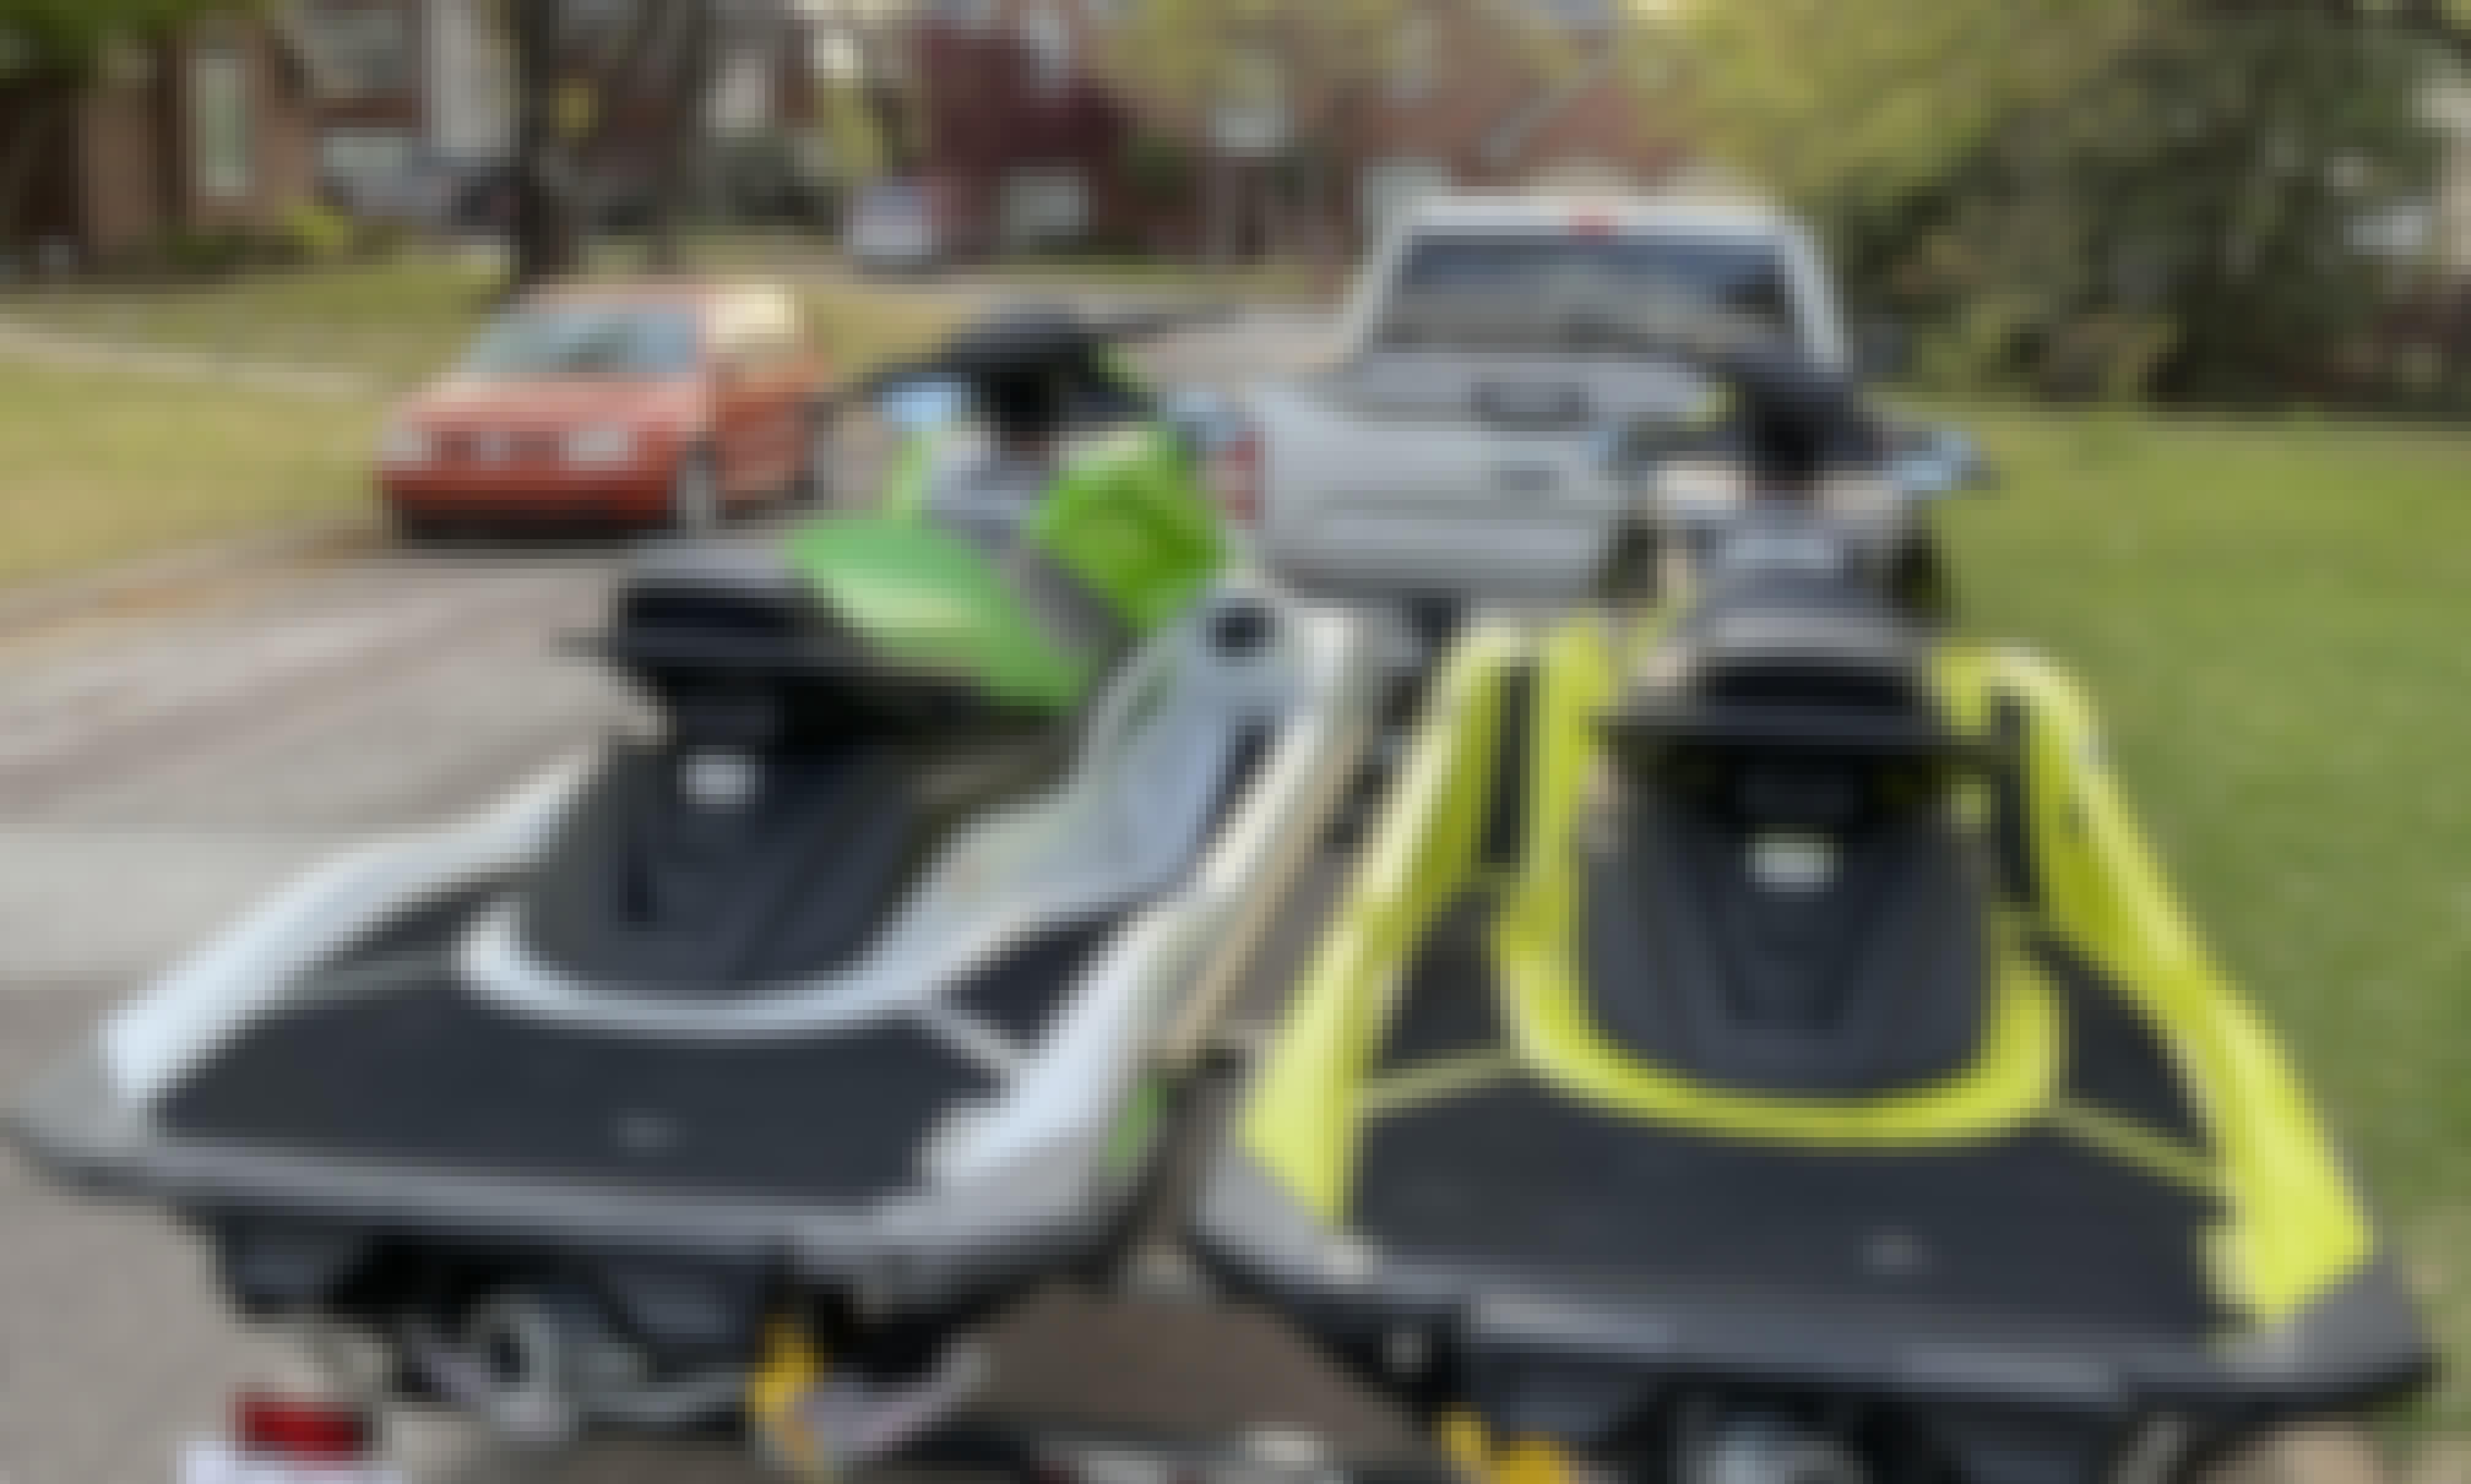 2021 Yamaha Waverunner Jet Skis For Rent x 2 | Grapevine Lake